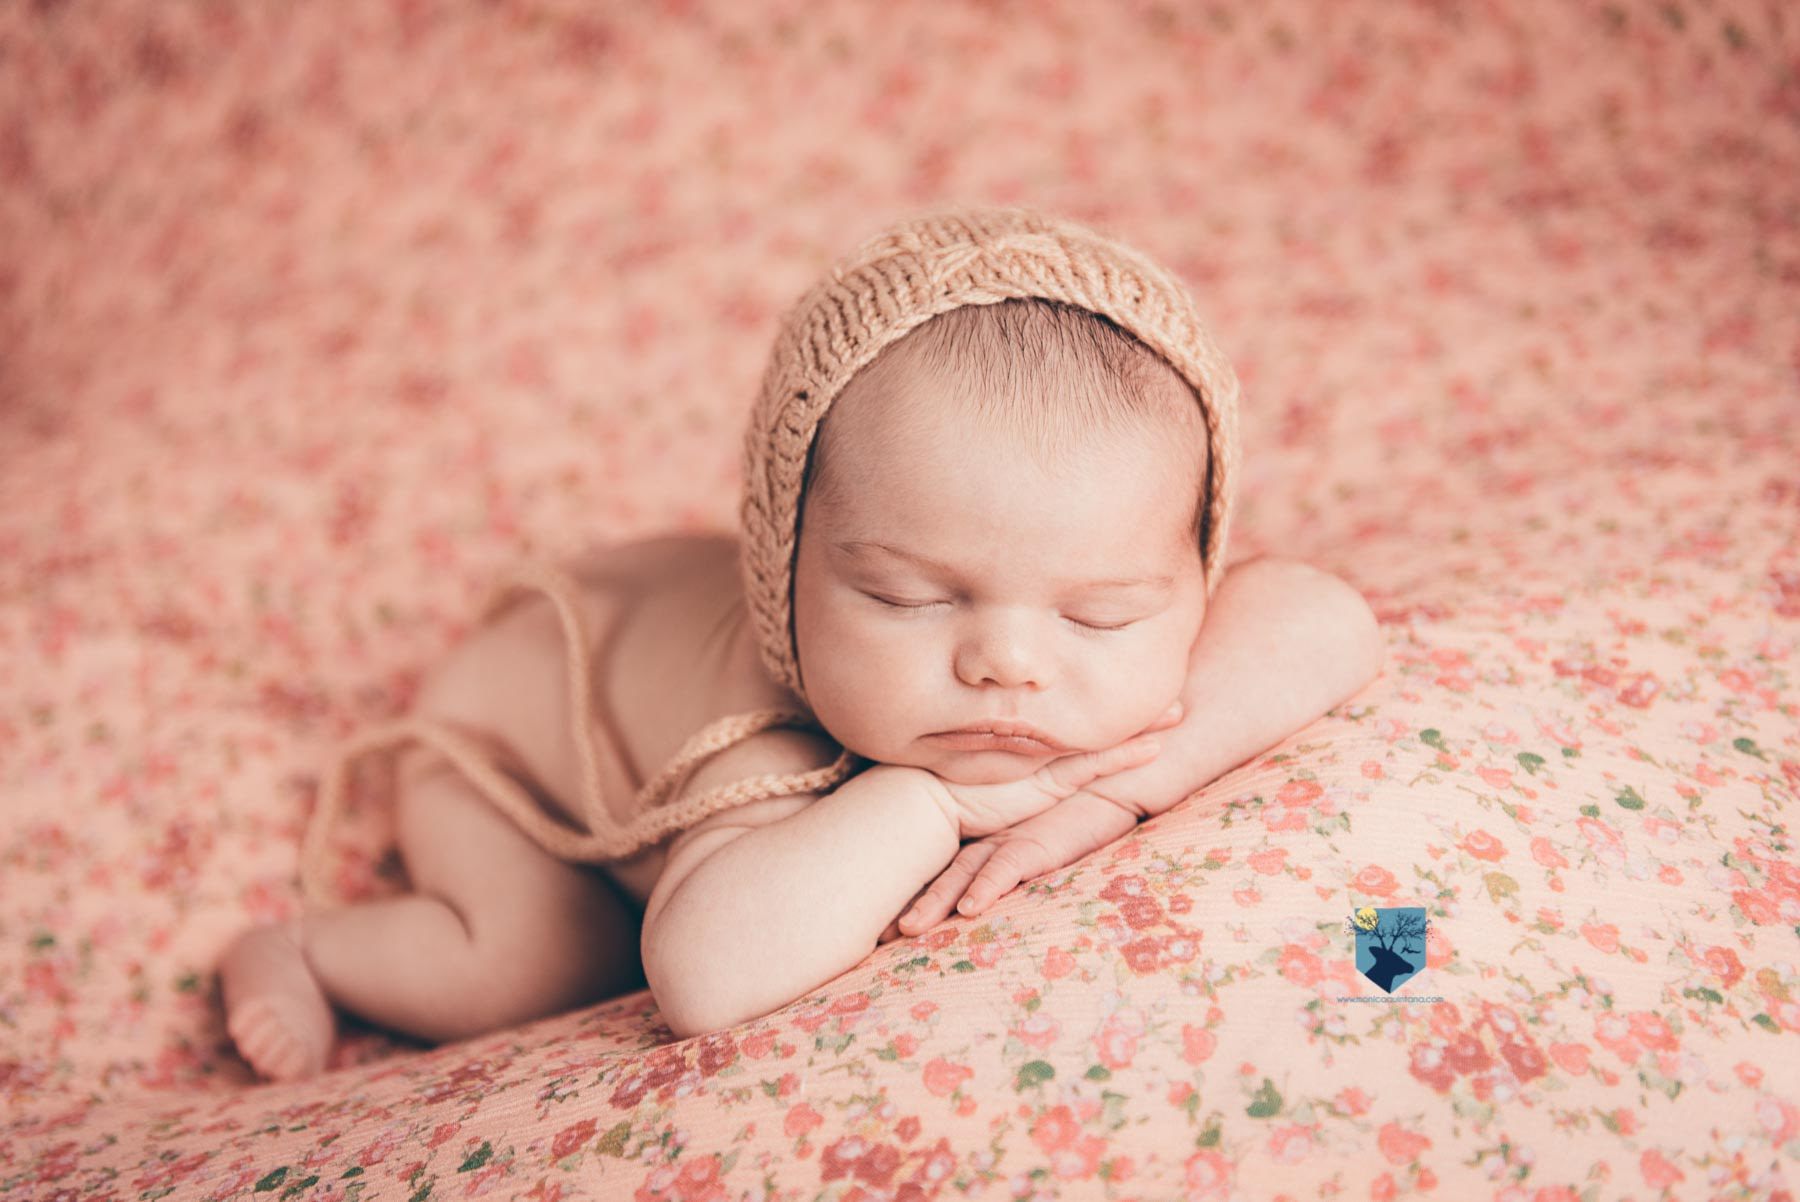 fotografia, fotos, fotografa, girona, figueres, emporda, monica quintana, bebes, niños, recien nacido, newborn, familia, retrato